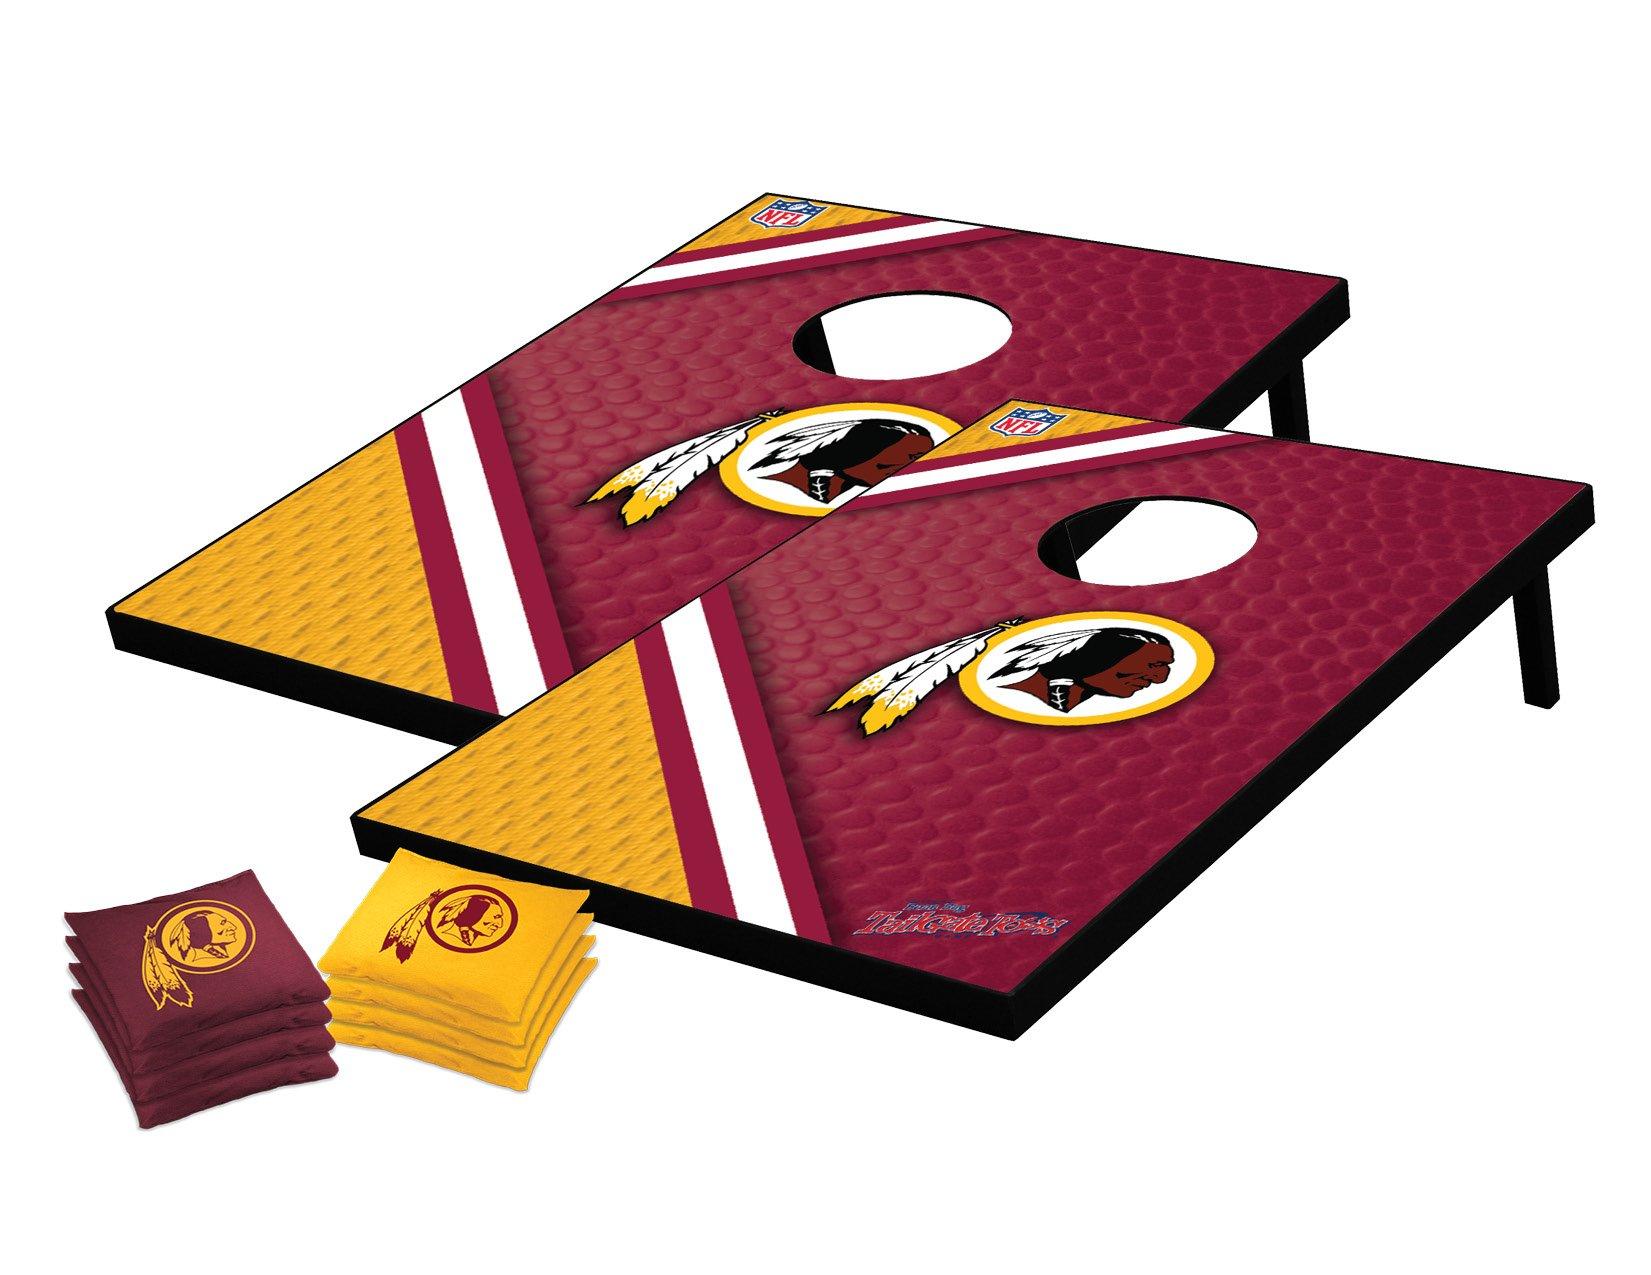 Wild Sports NFL Washington Redskins Tailgate Toss Bean Bag Game Set, Medium